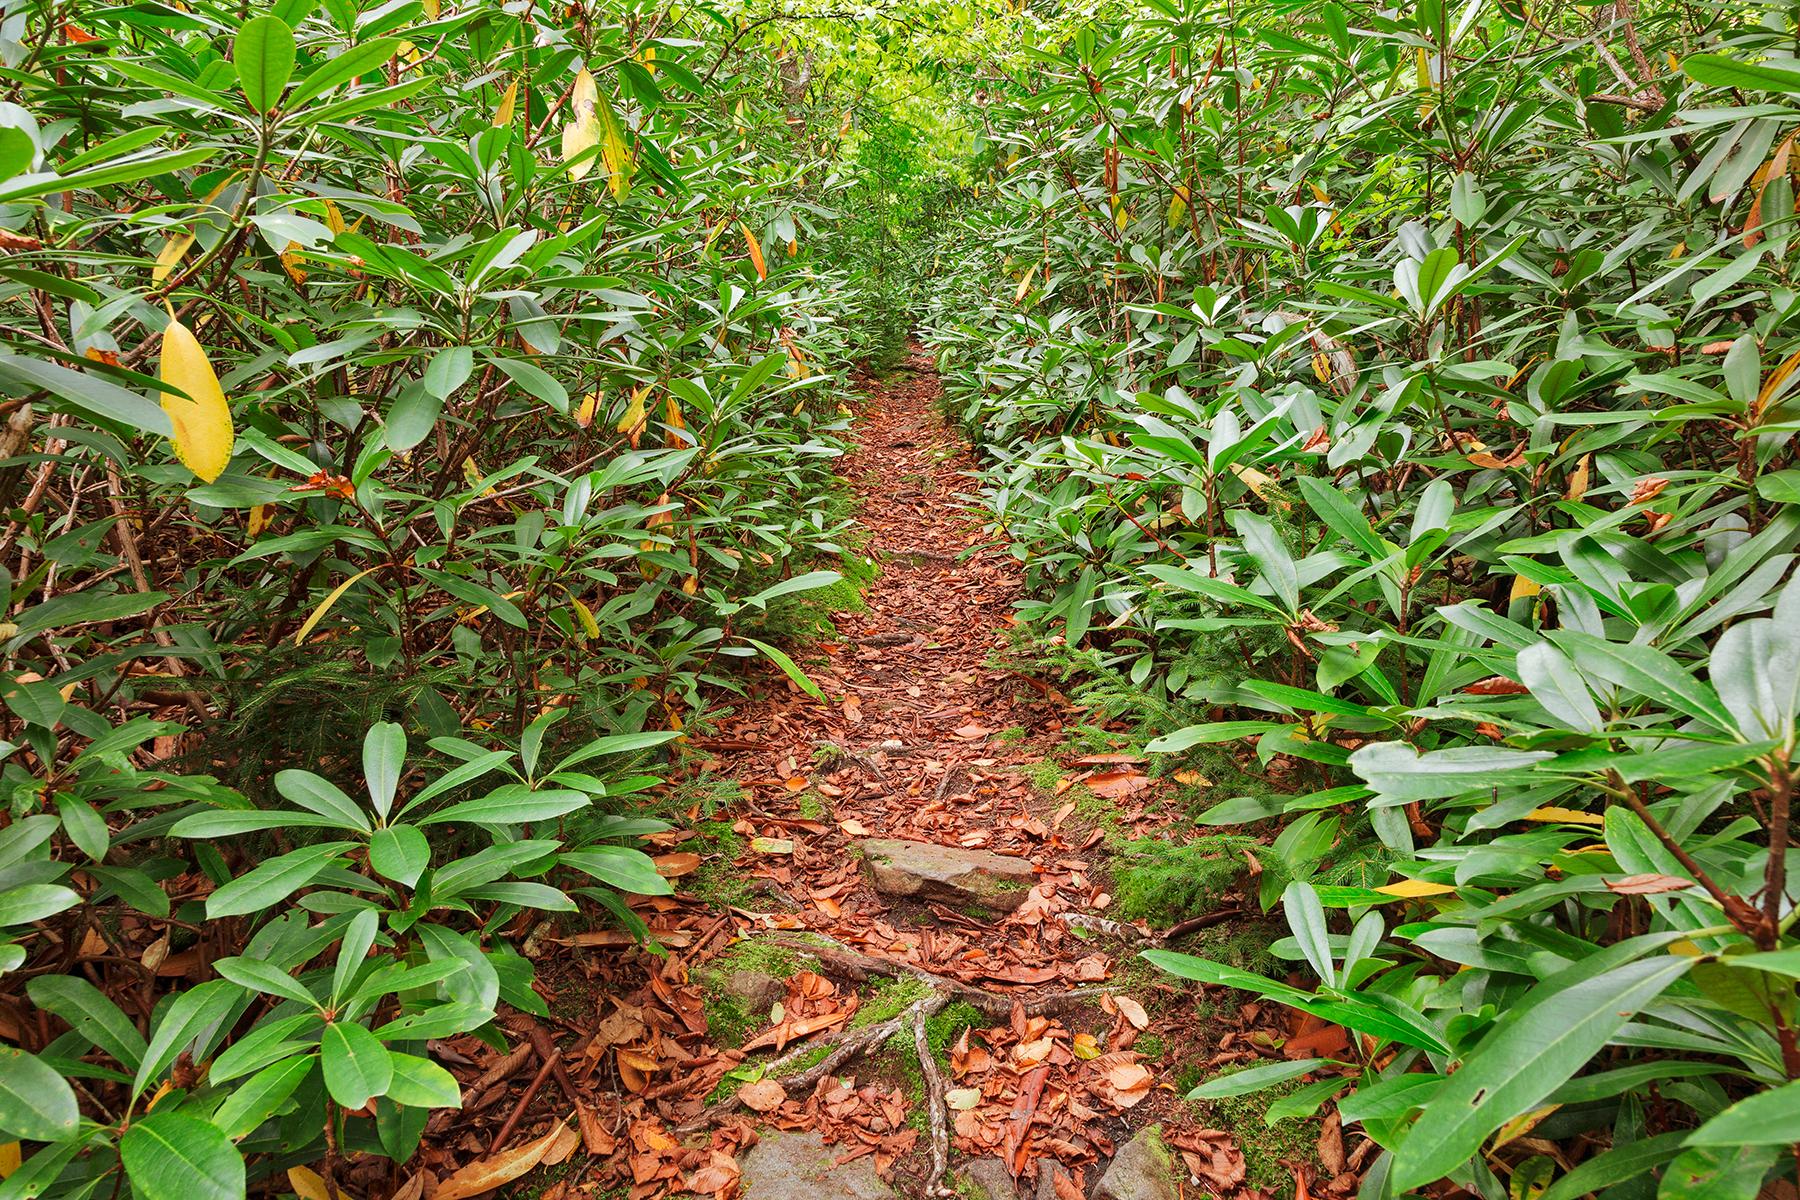 Rhododendron Canopy Trail, Plants, Serenity, Serene, Scenic, HQ Photo